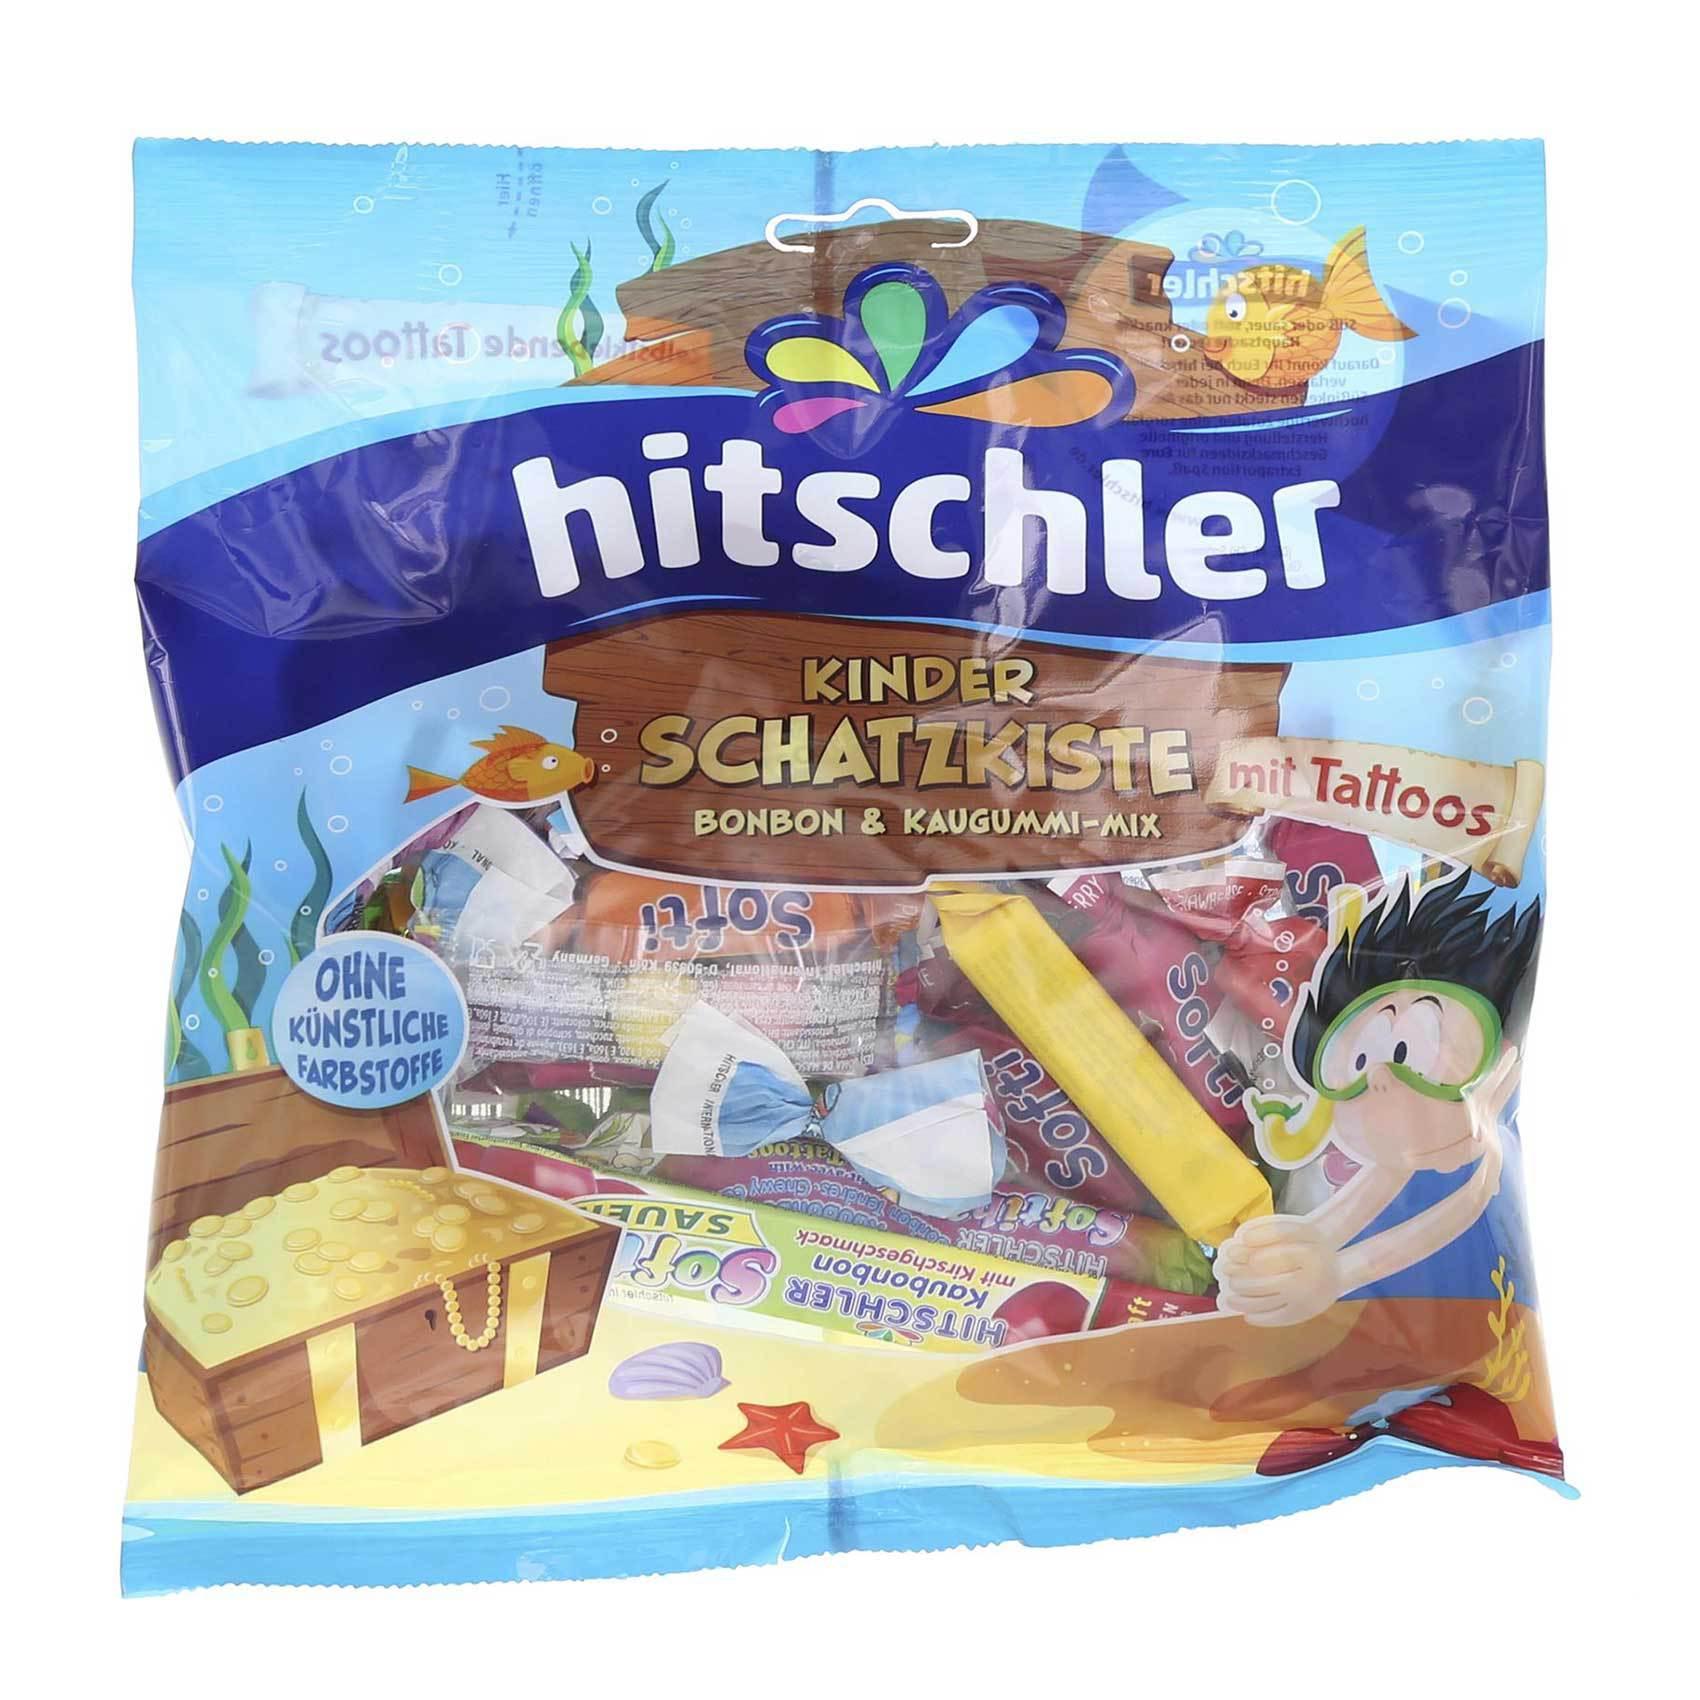 HITSCHLER KINDER TREASURE 205G